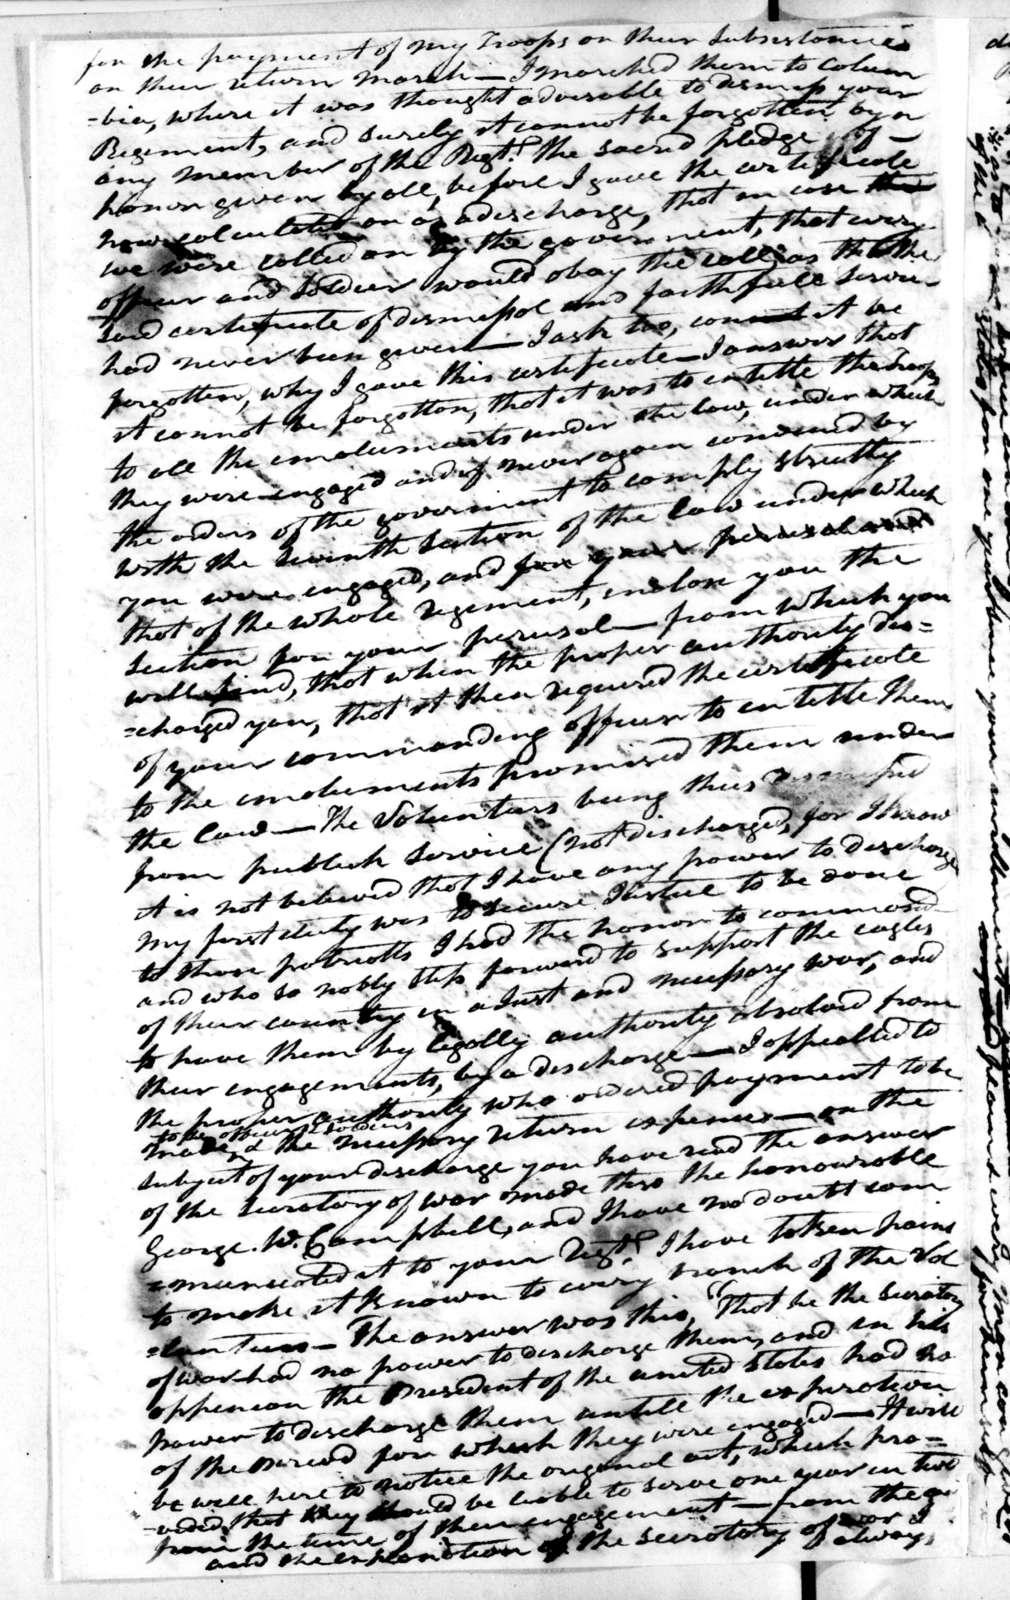 Andrew Jackson to William Martin, December 4, 1813